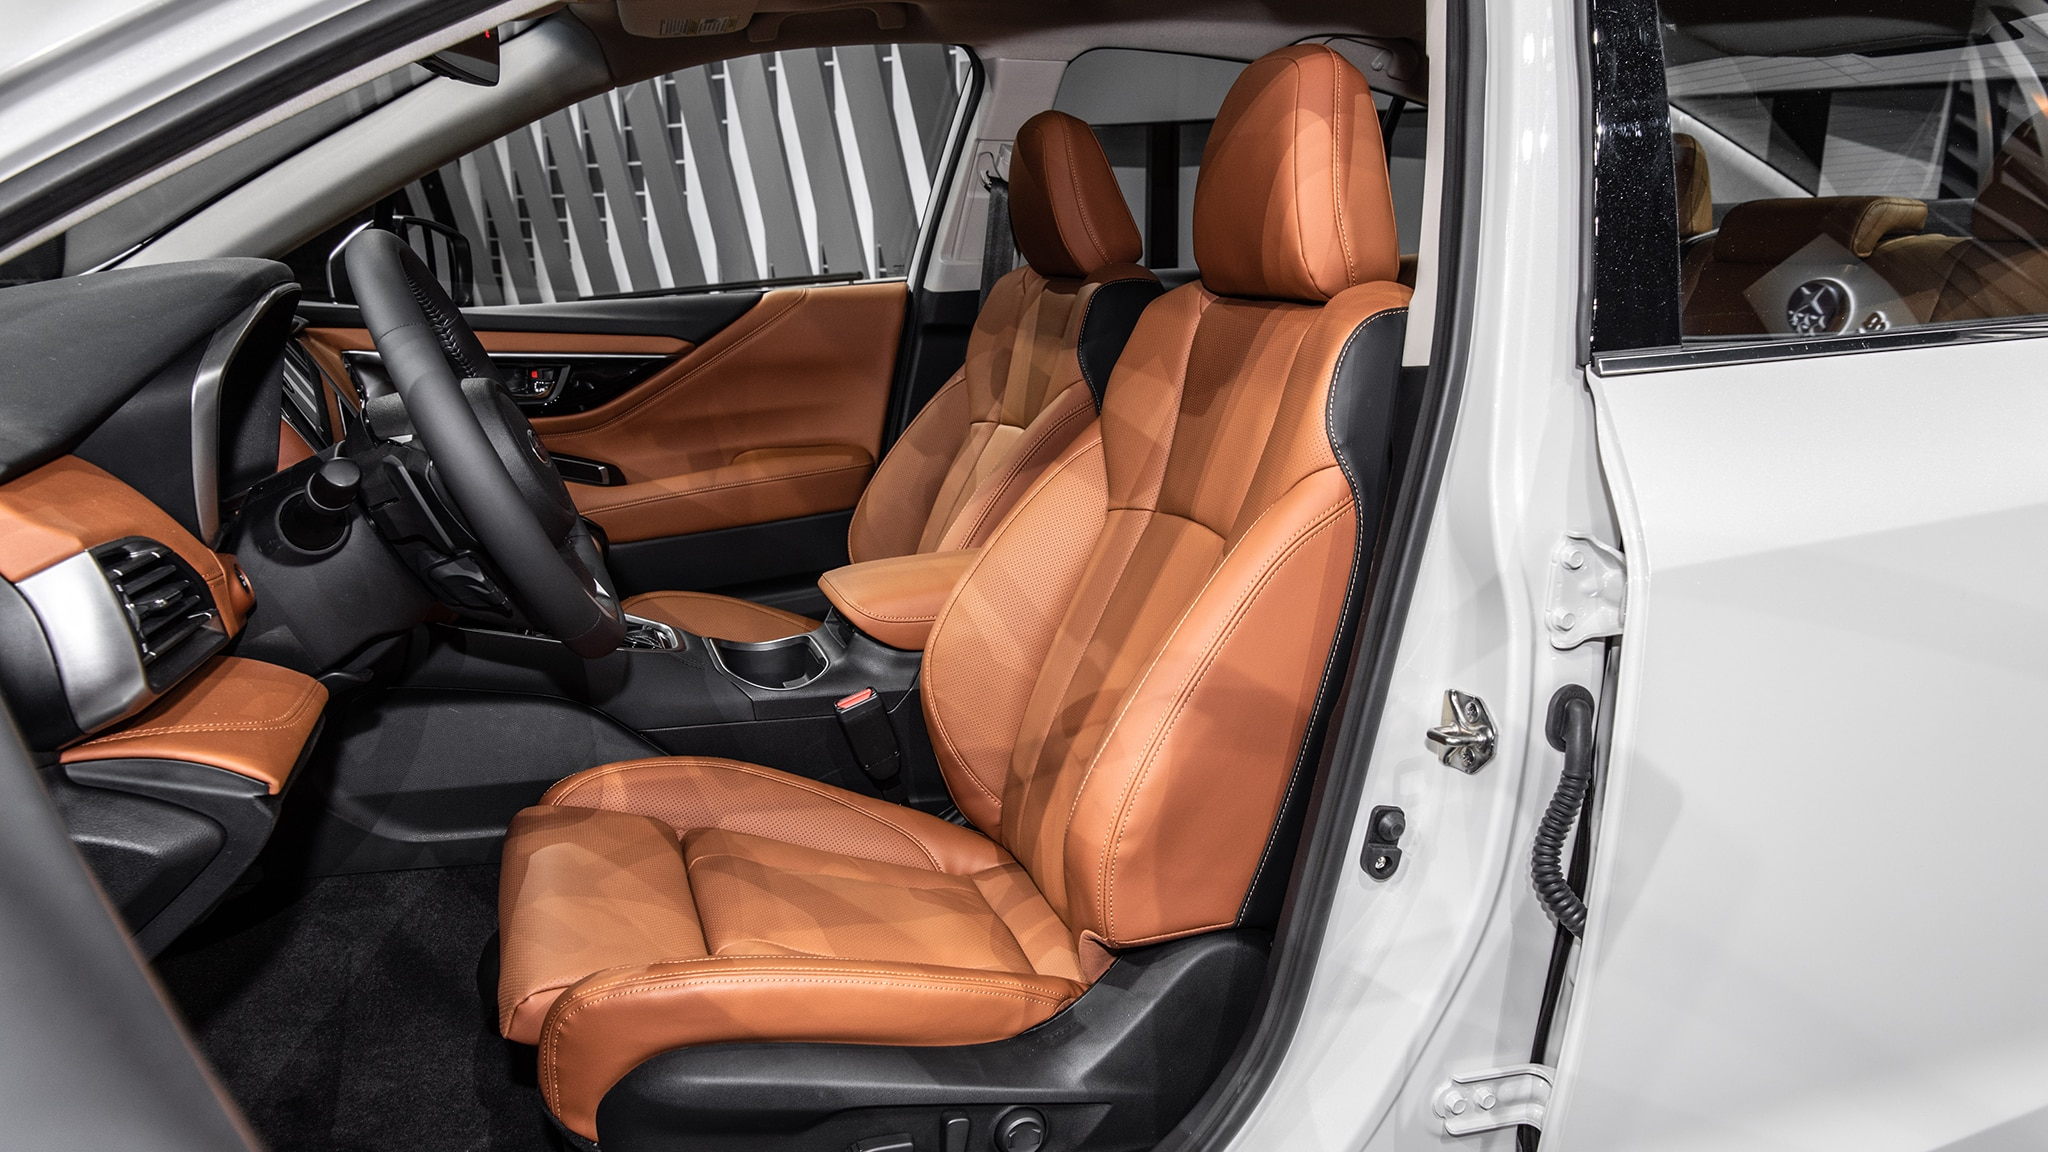 2020 Subaru Legacy Photos and Info: New Platform and New XT Trims